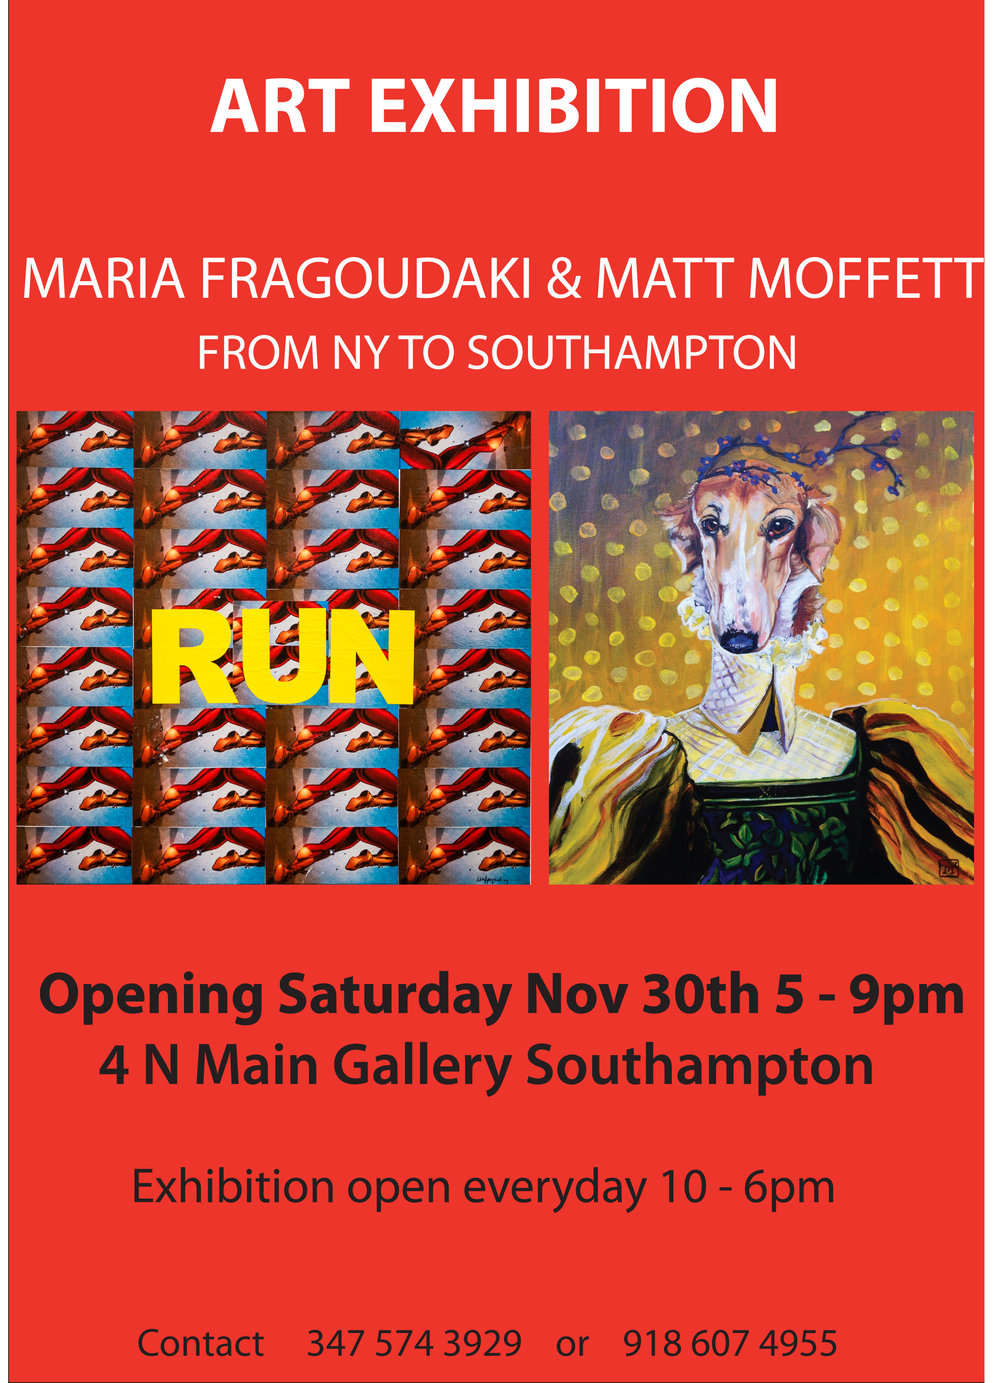 Invitation Exhibition 4N Main Gallery.jpg